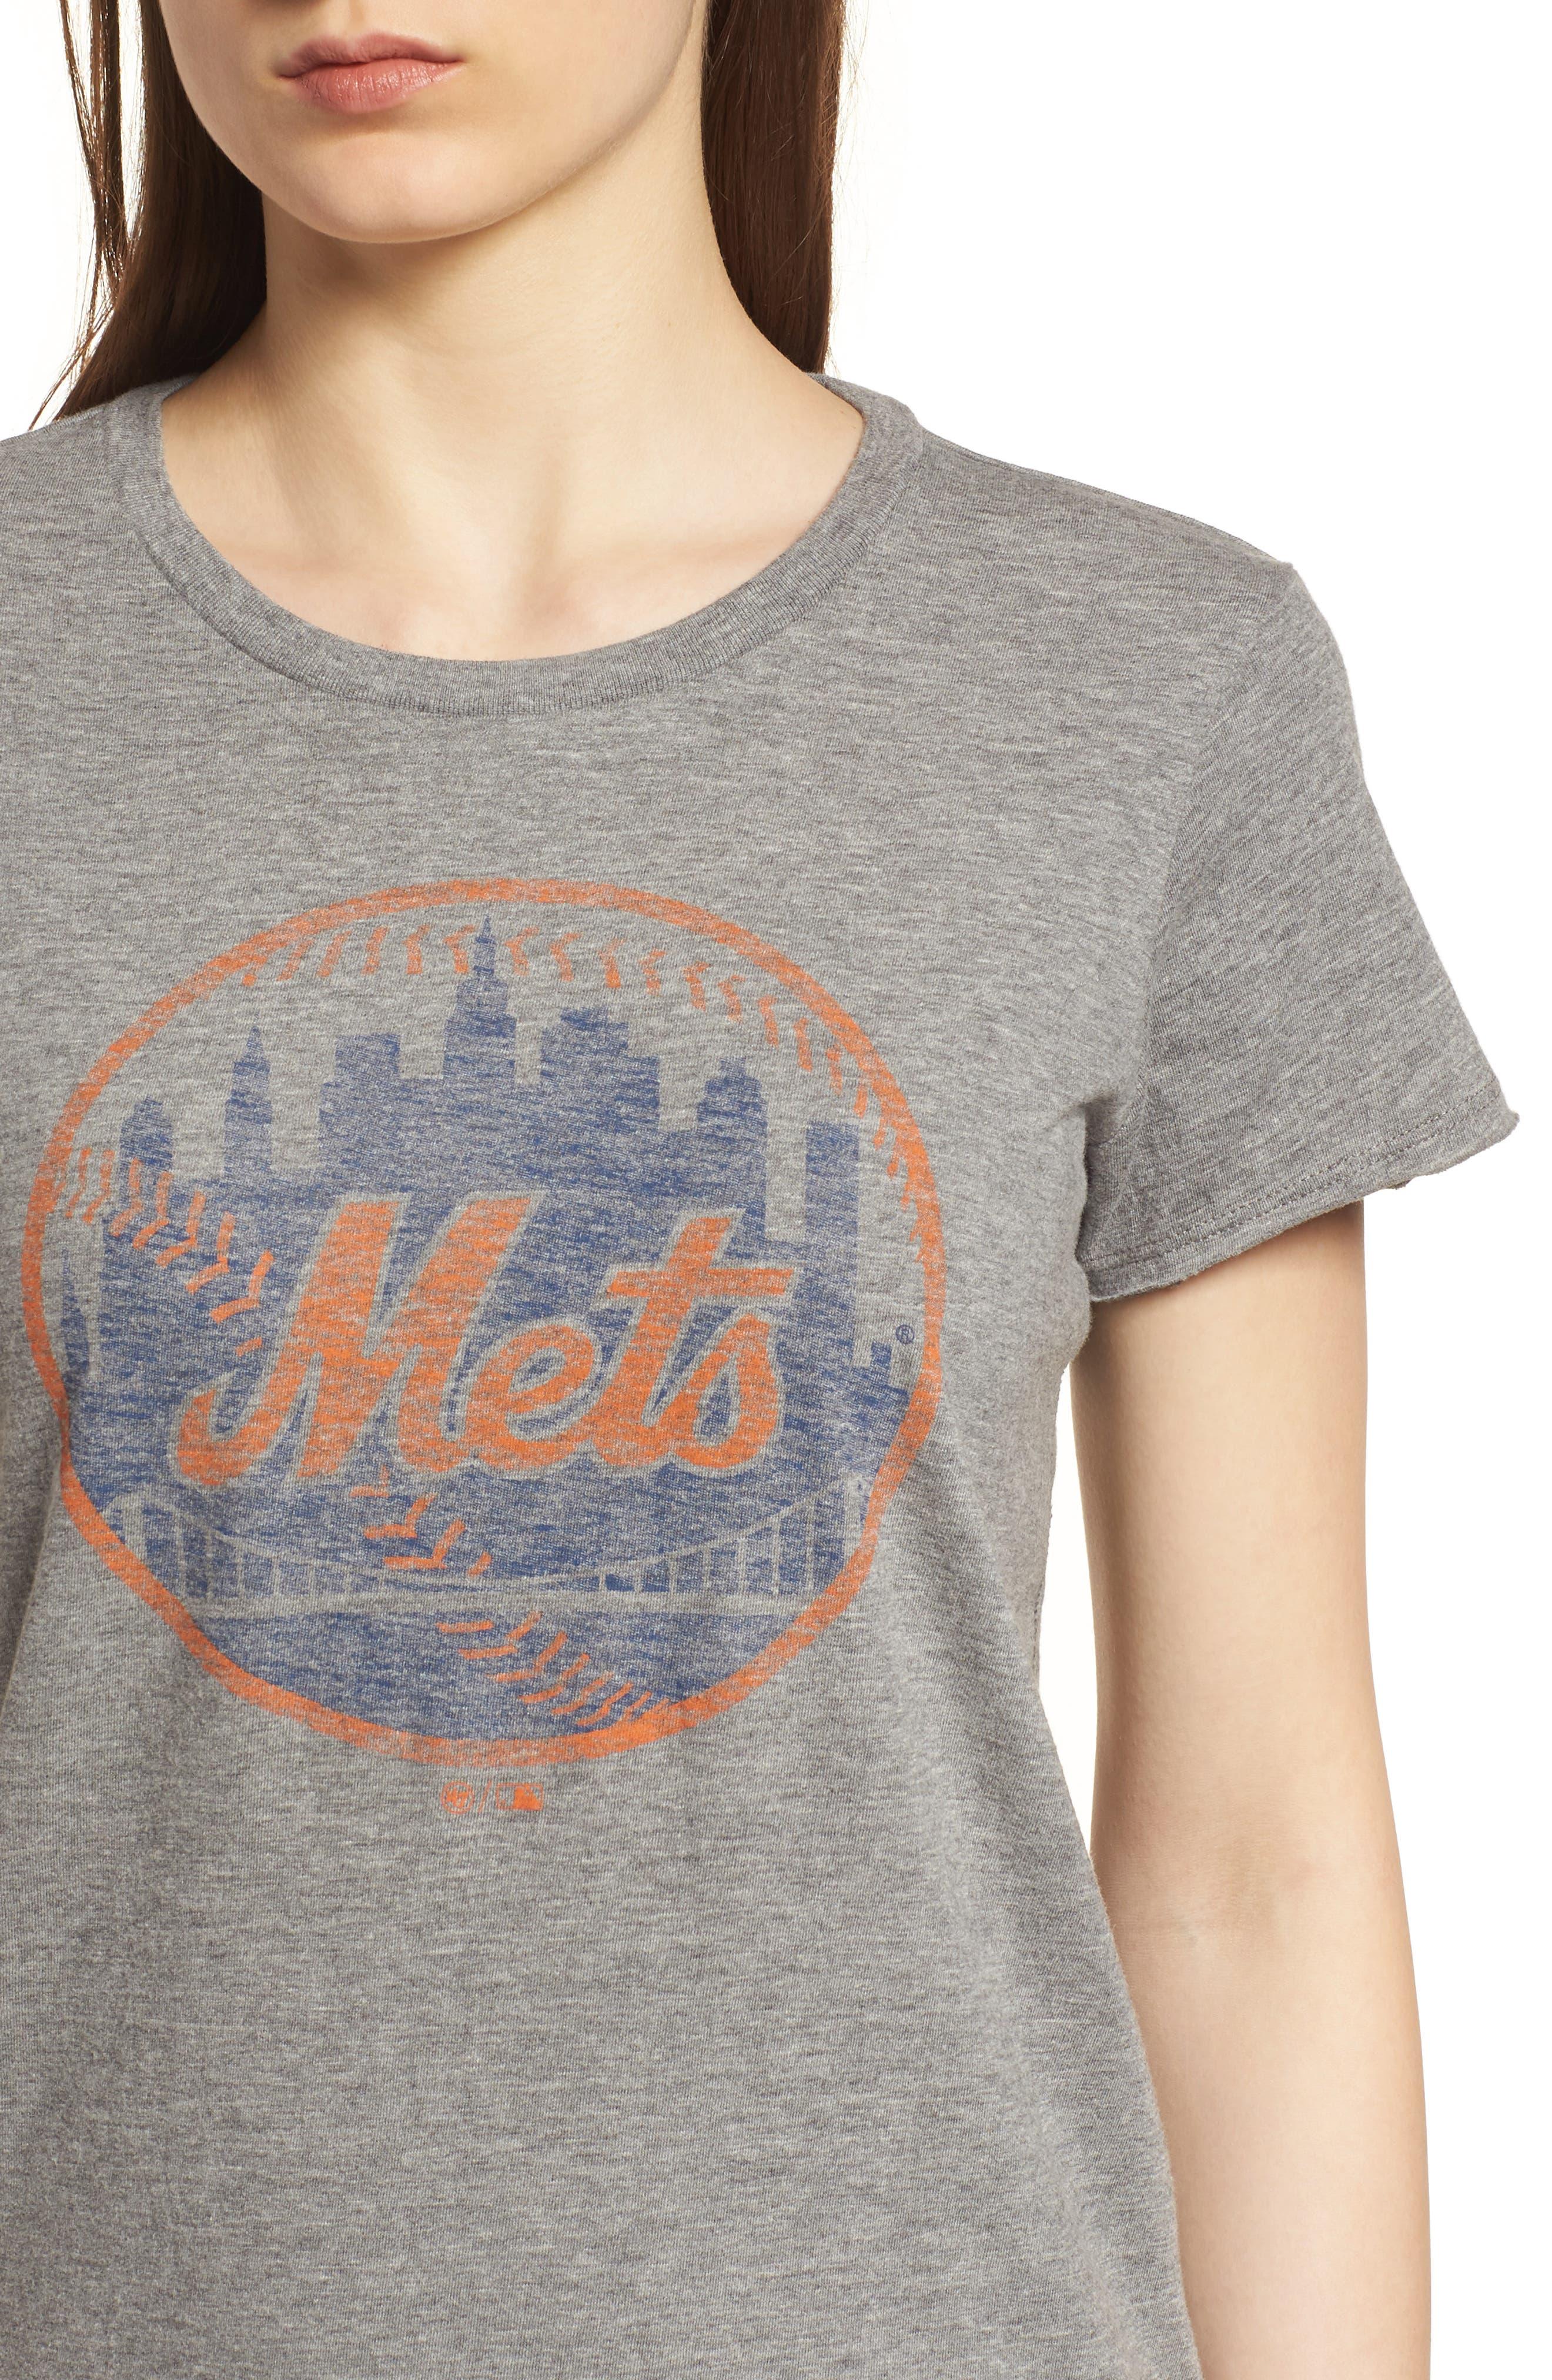 New York Mets Fader Letter Tee,                             Alternate thumbnail 4, color,                             021